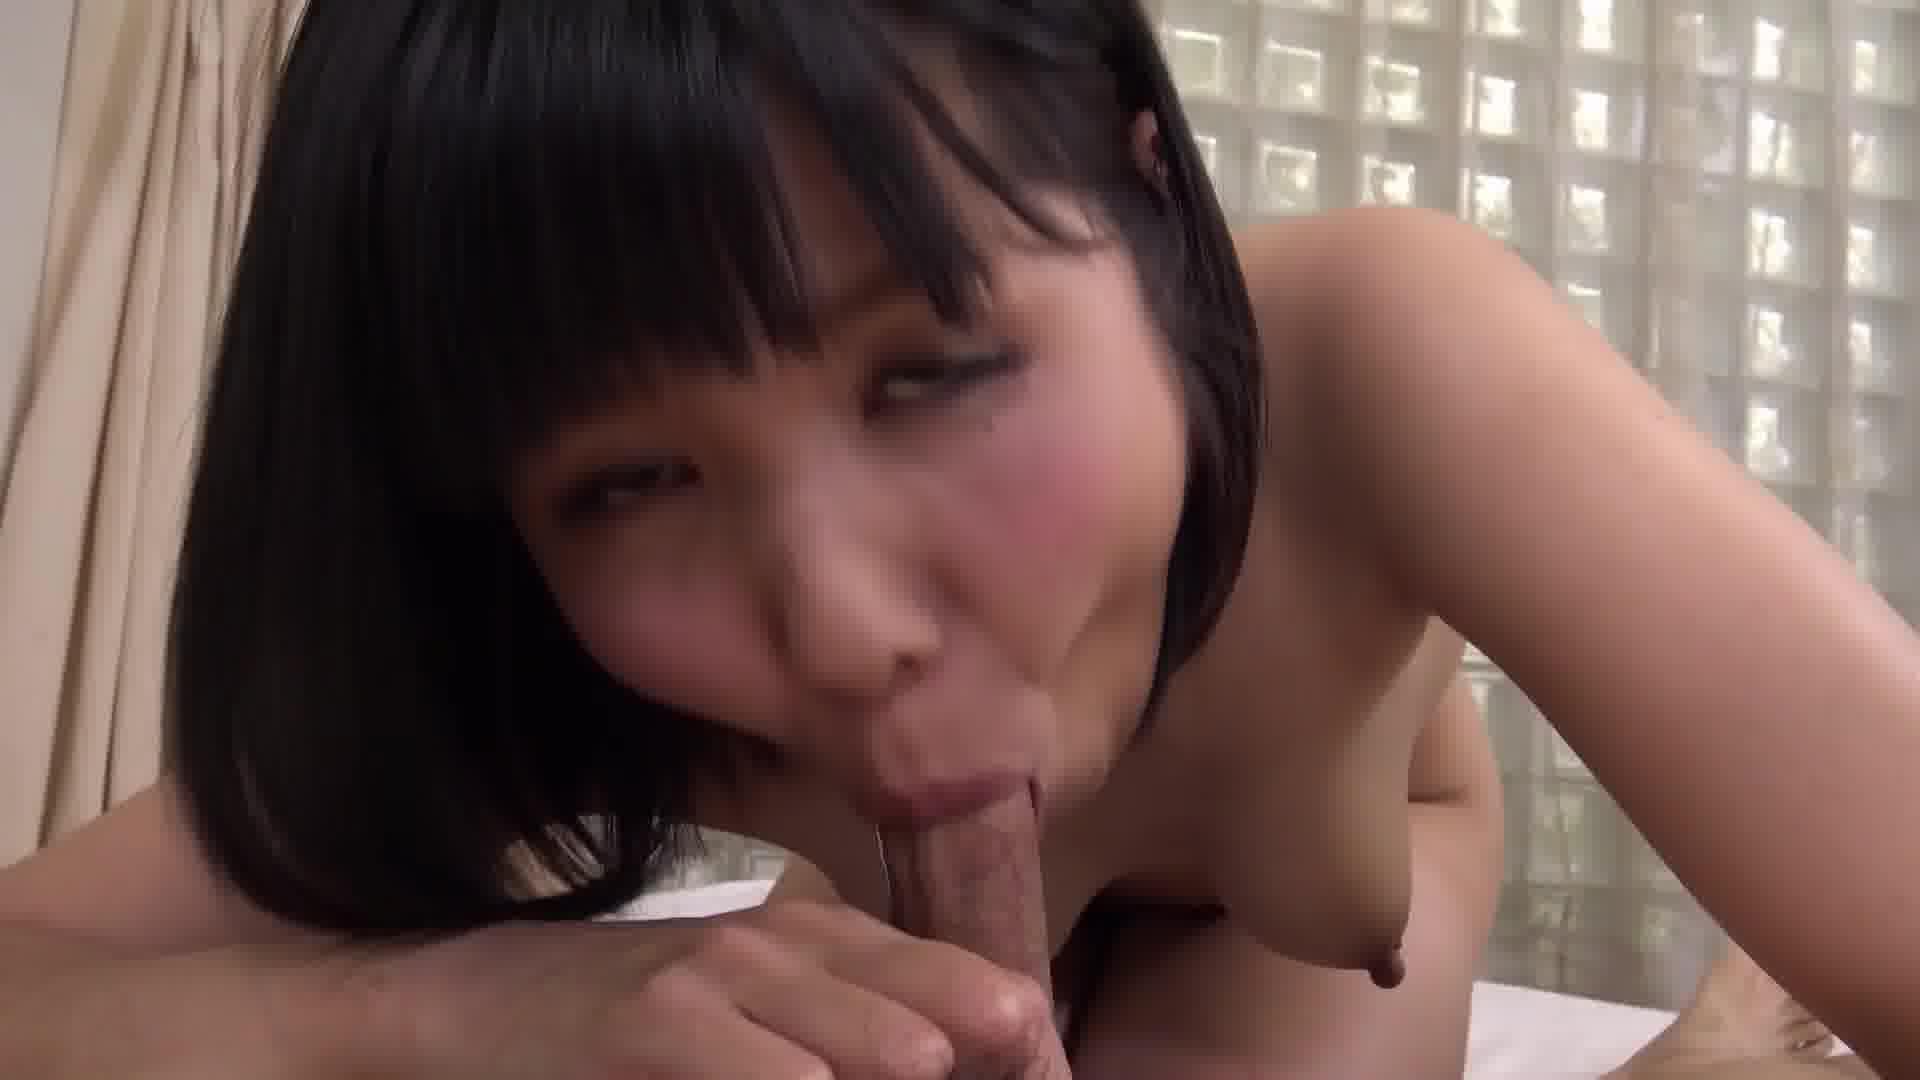 THE 未公開 ~敏感マゾ乳のすごいパイズリ7~ - 花守みらい【巨乳・パイズリ・3P】